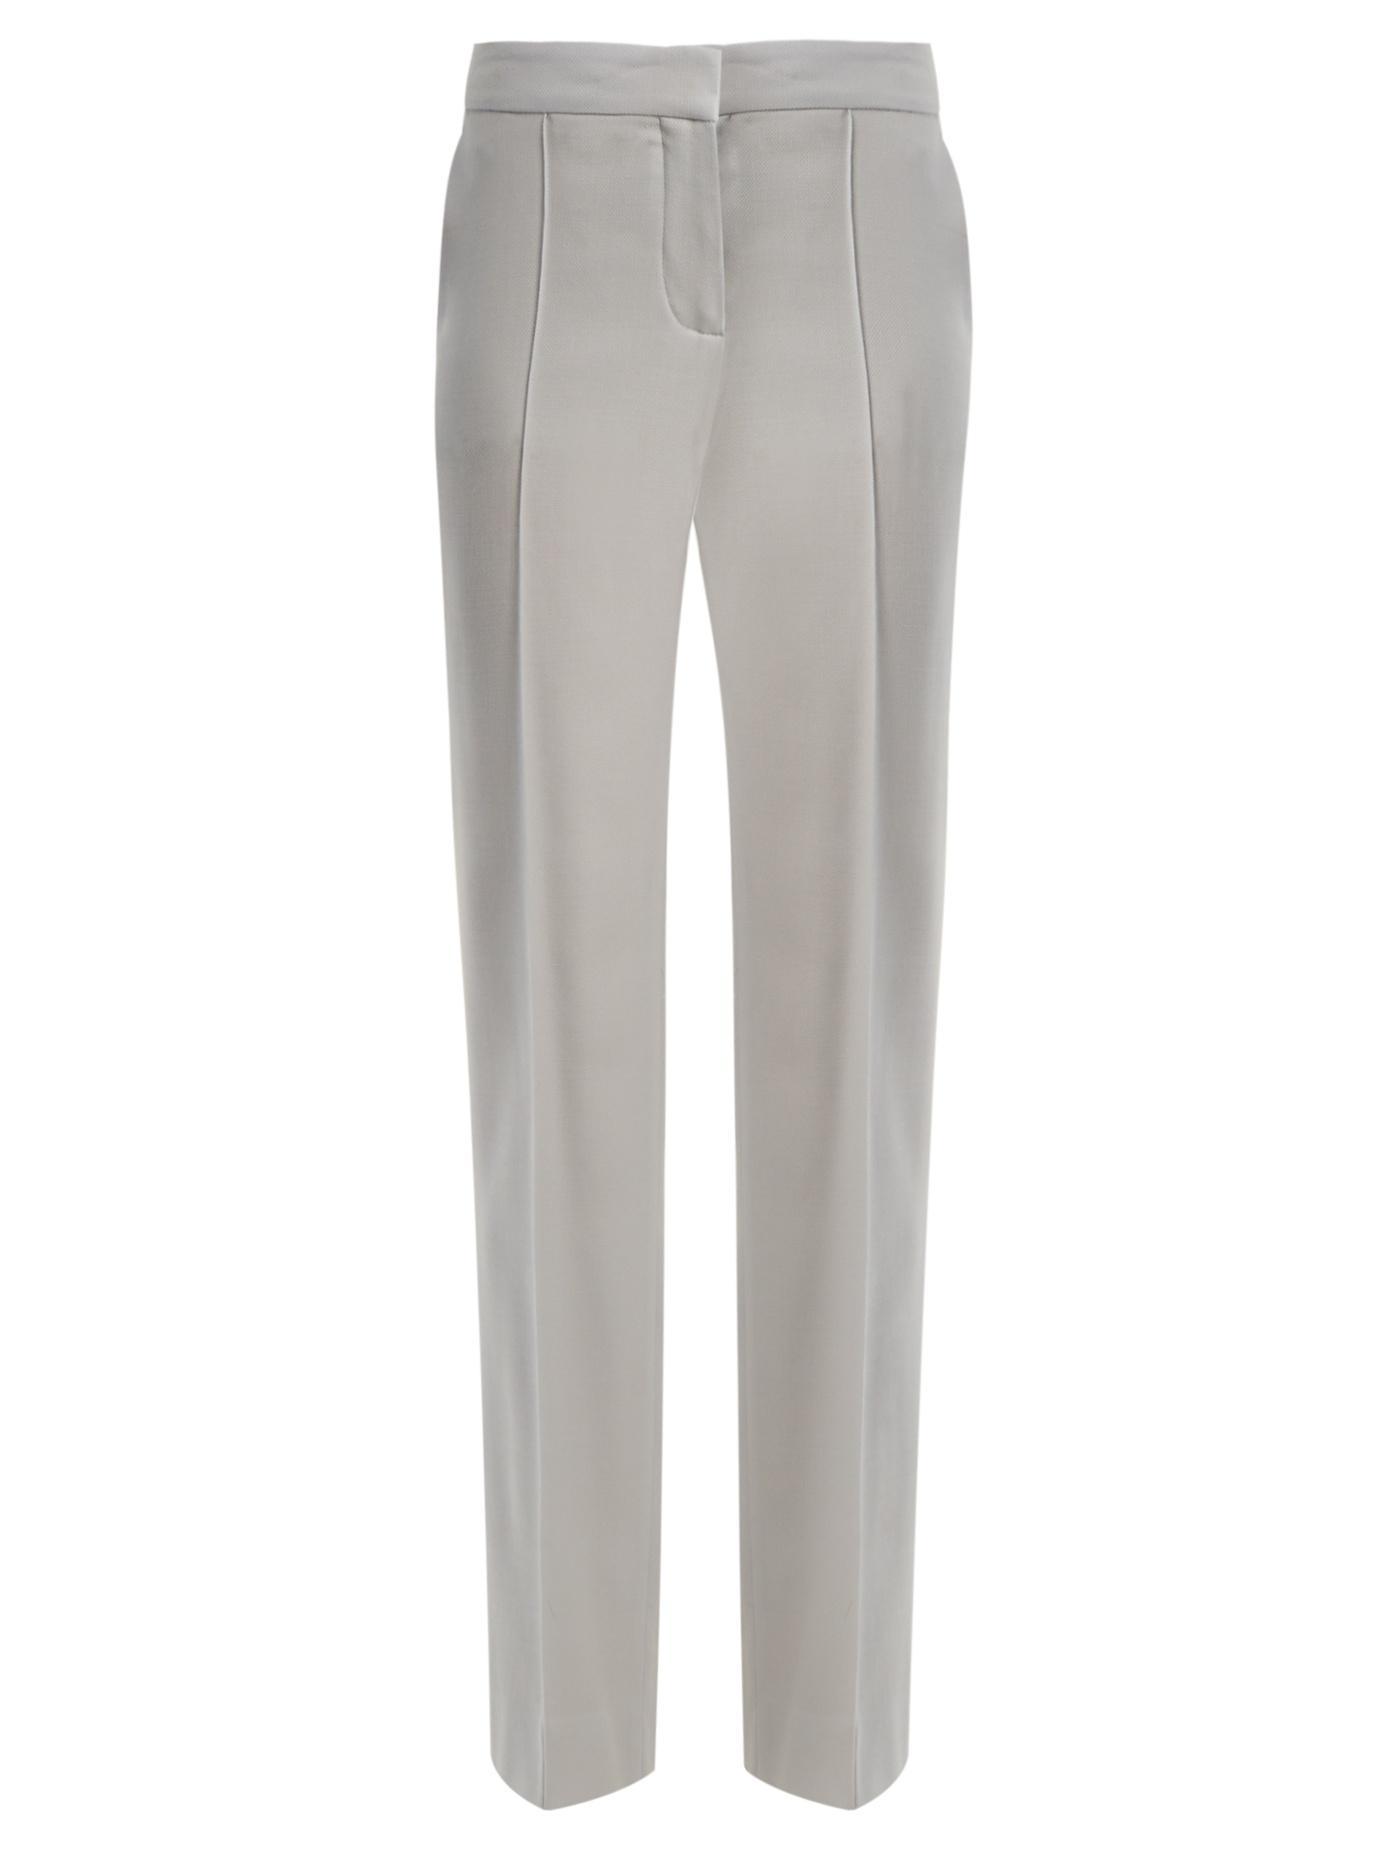 8d6384d10338d Stella Mccartney - Anna Mid Rise Straight Leg Wool Trousers - Womens -  Light Blue